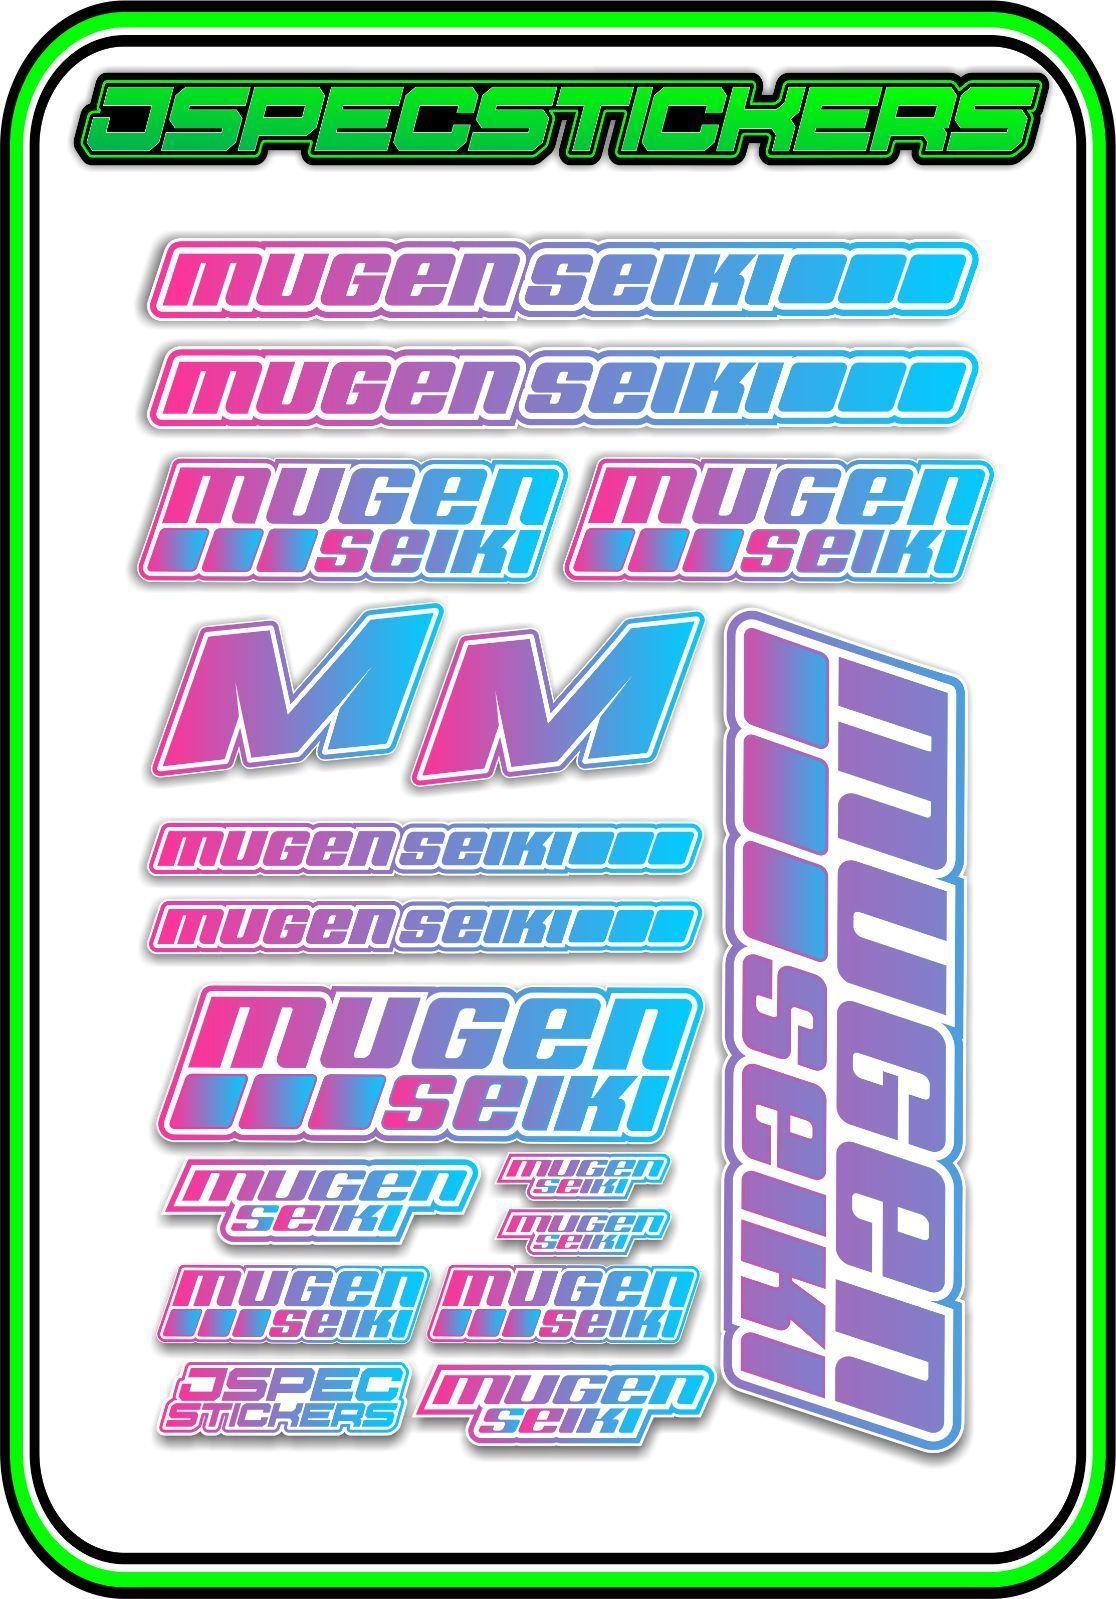 5 44 Aud Mugen Seiki Rc Sticker Sheet 1 8 Buggy 1 10 Car Mtx6r Mbx7r Mrx6 Gt Eco Pink Blu Ebay Collectibles Sticker Sheets Buggy Ebay [ 1599 x 1116 Pixel ]